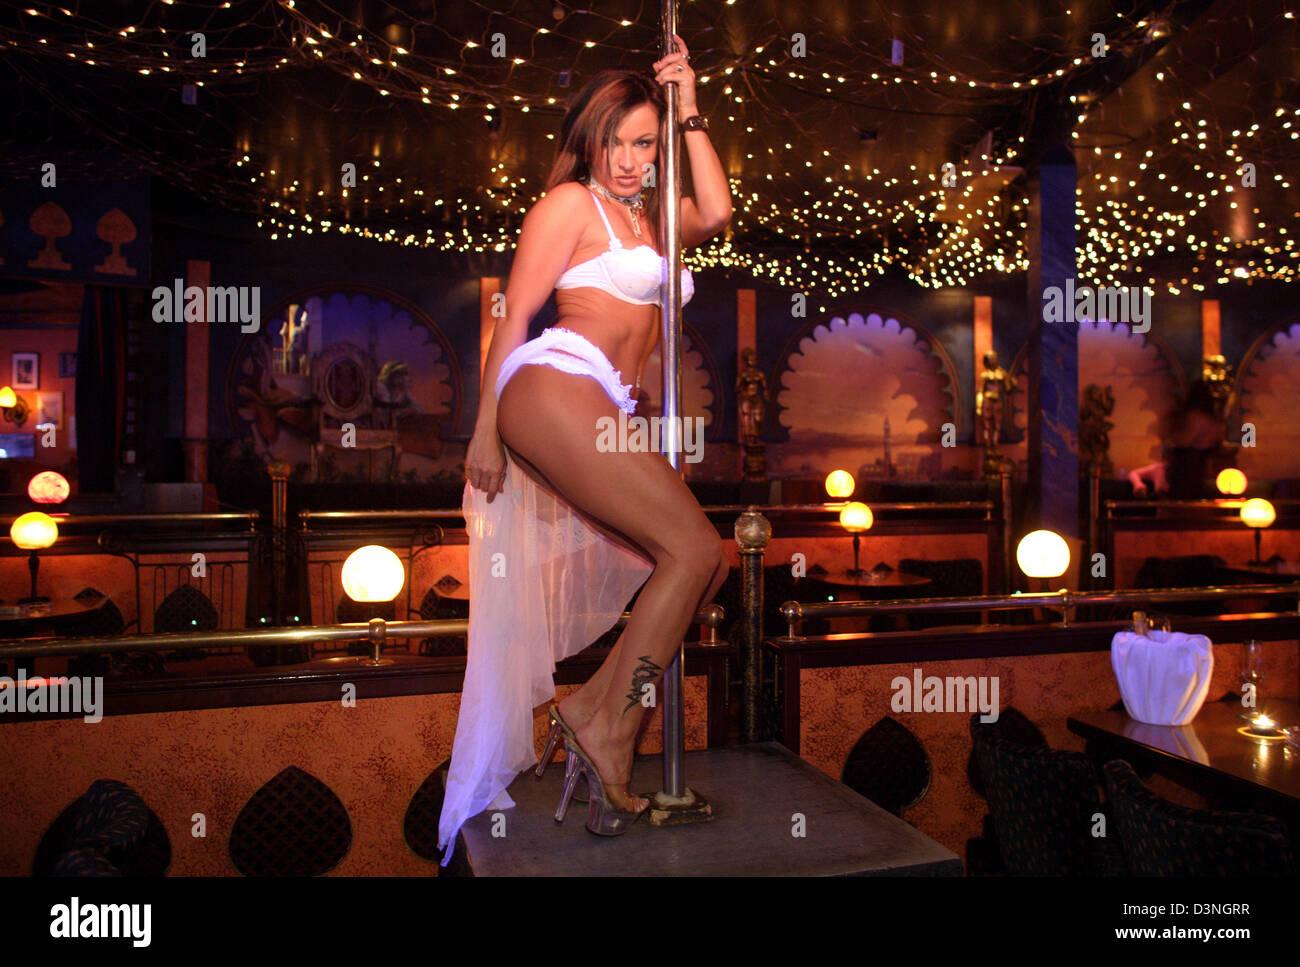 youclub sex pascha table dance